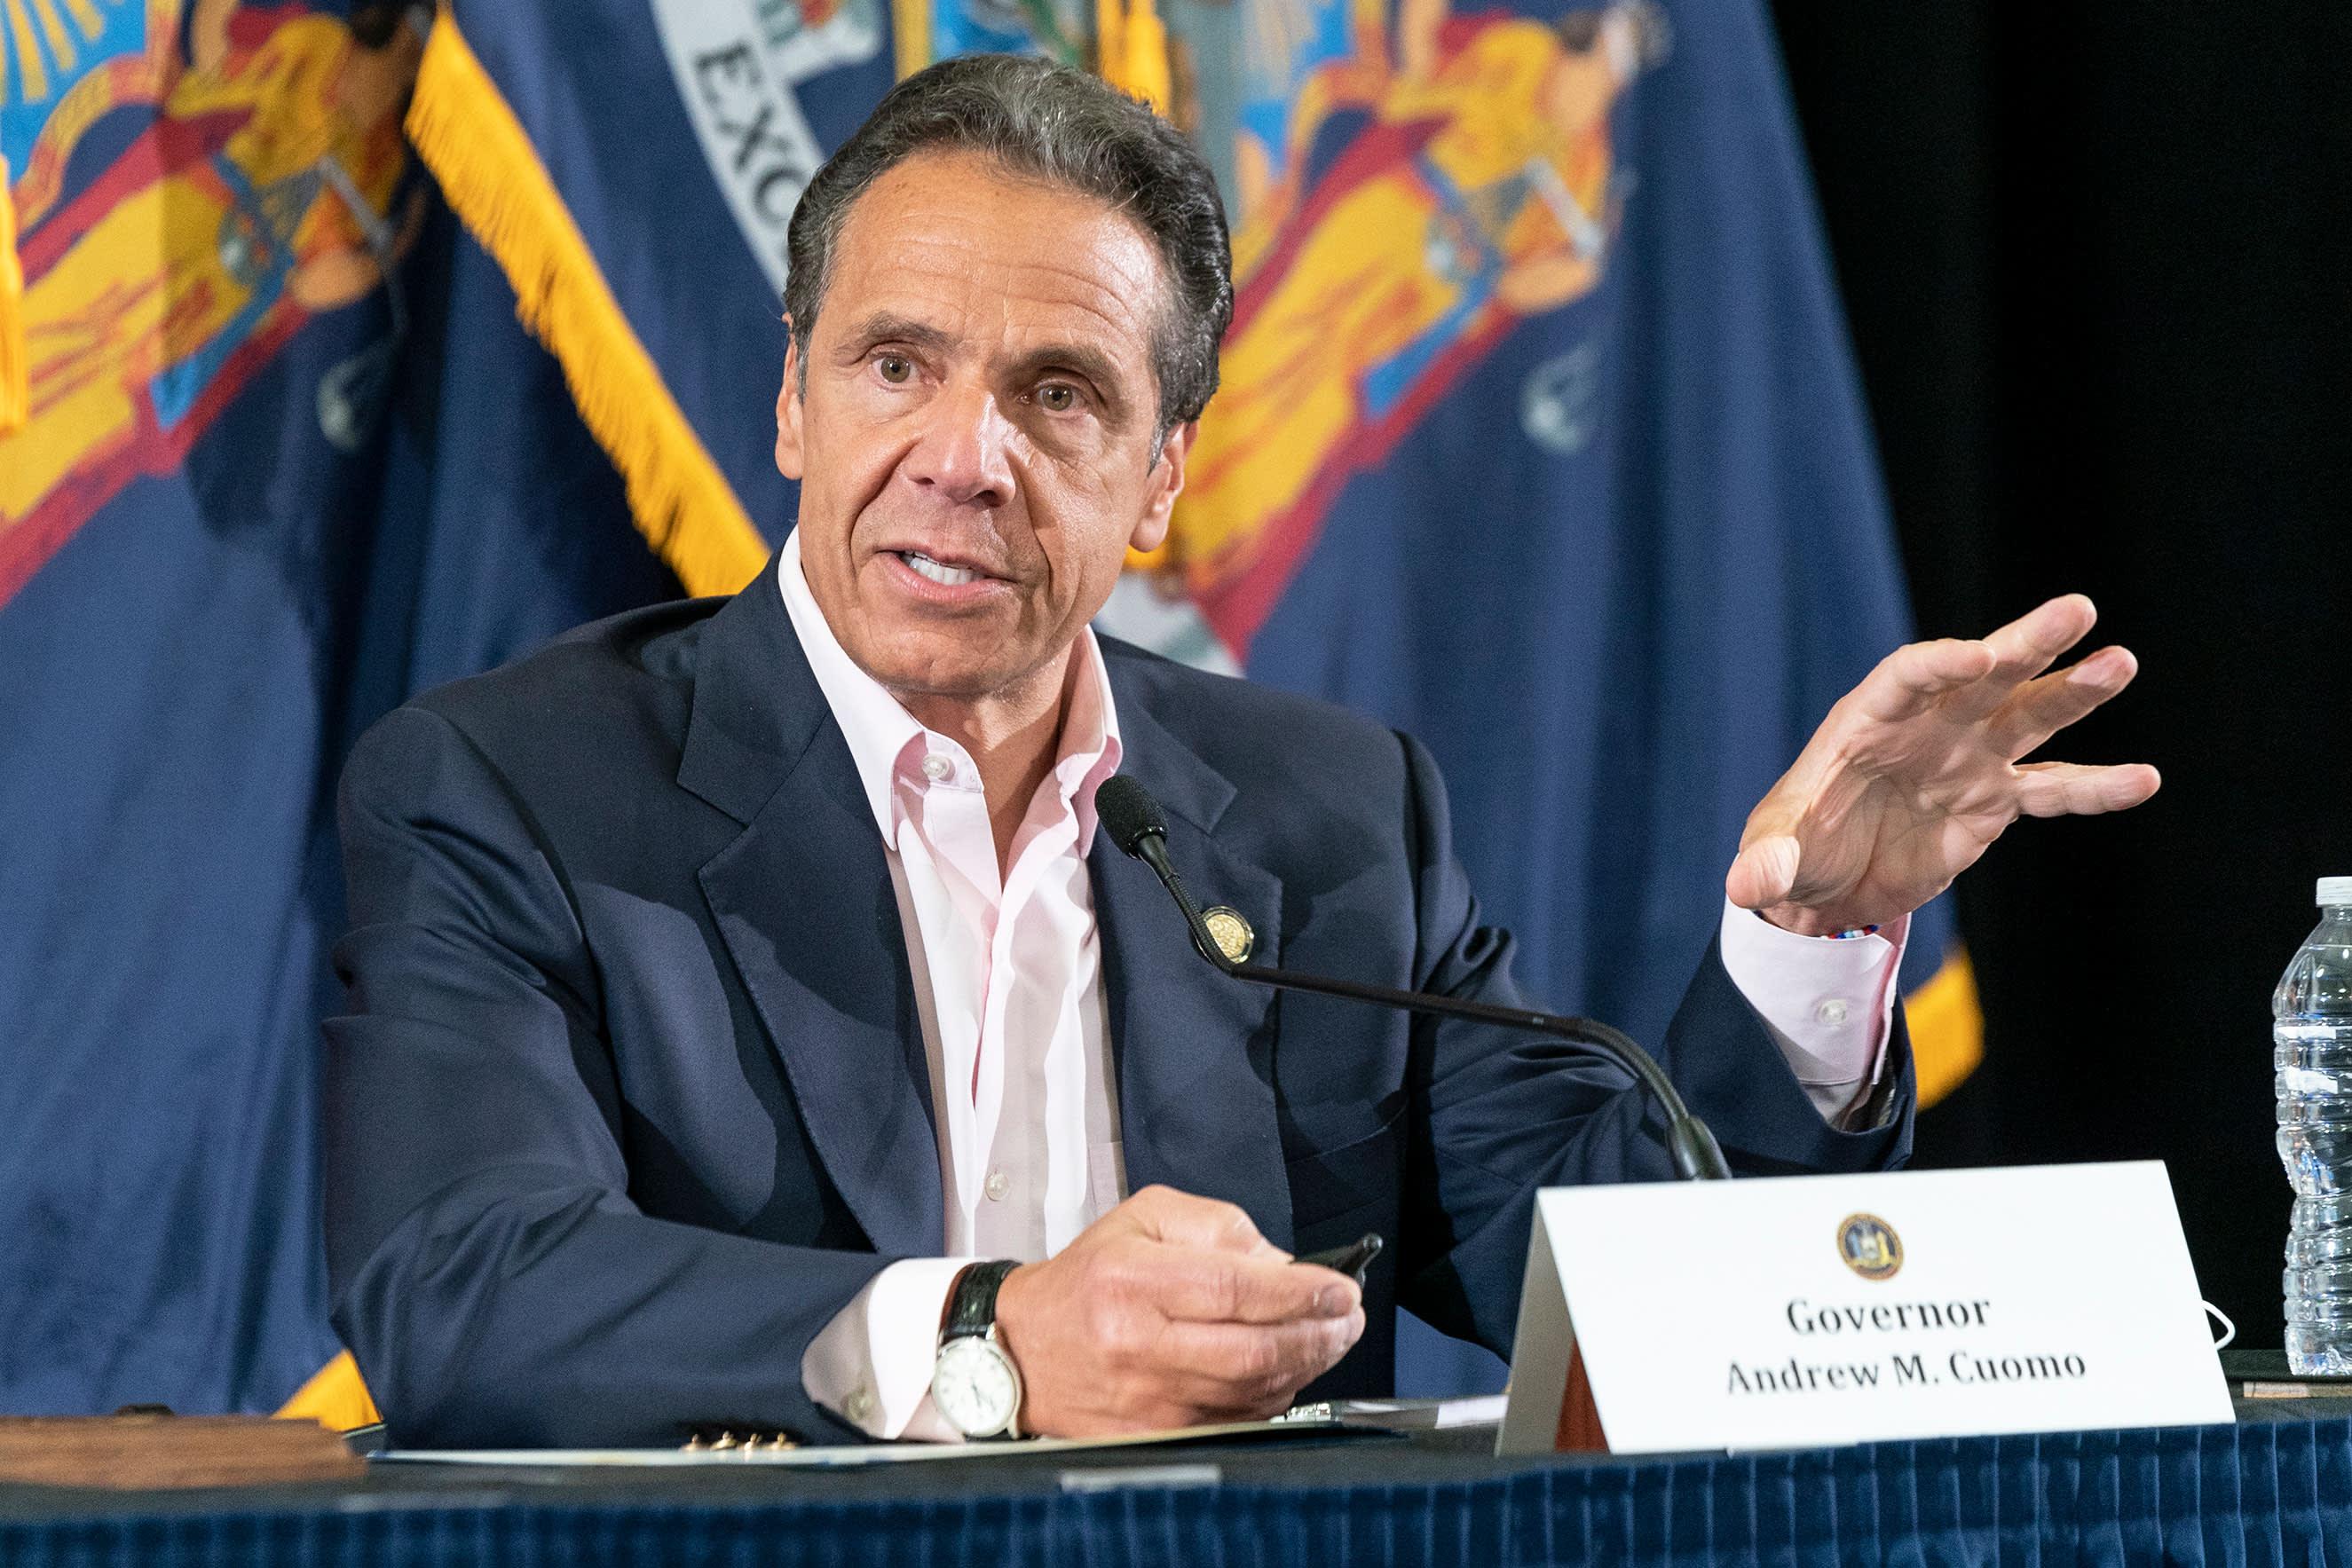 New York sees coronavirus clusters pop up in Orthodox Jewish communities, Gov. Cuomo says